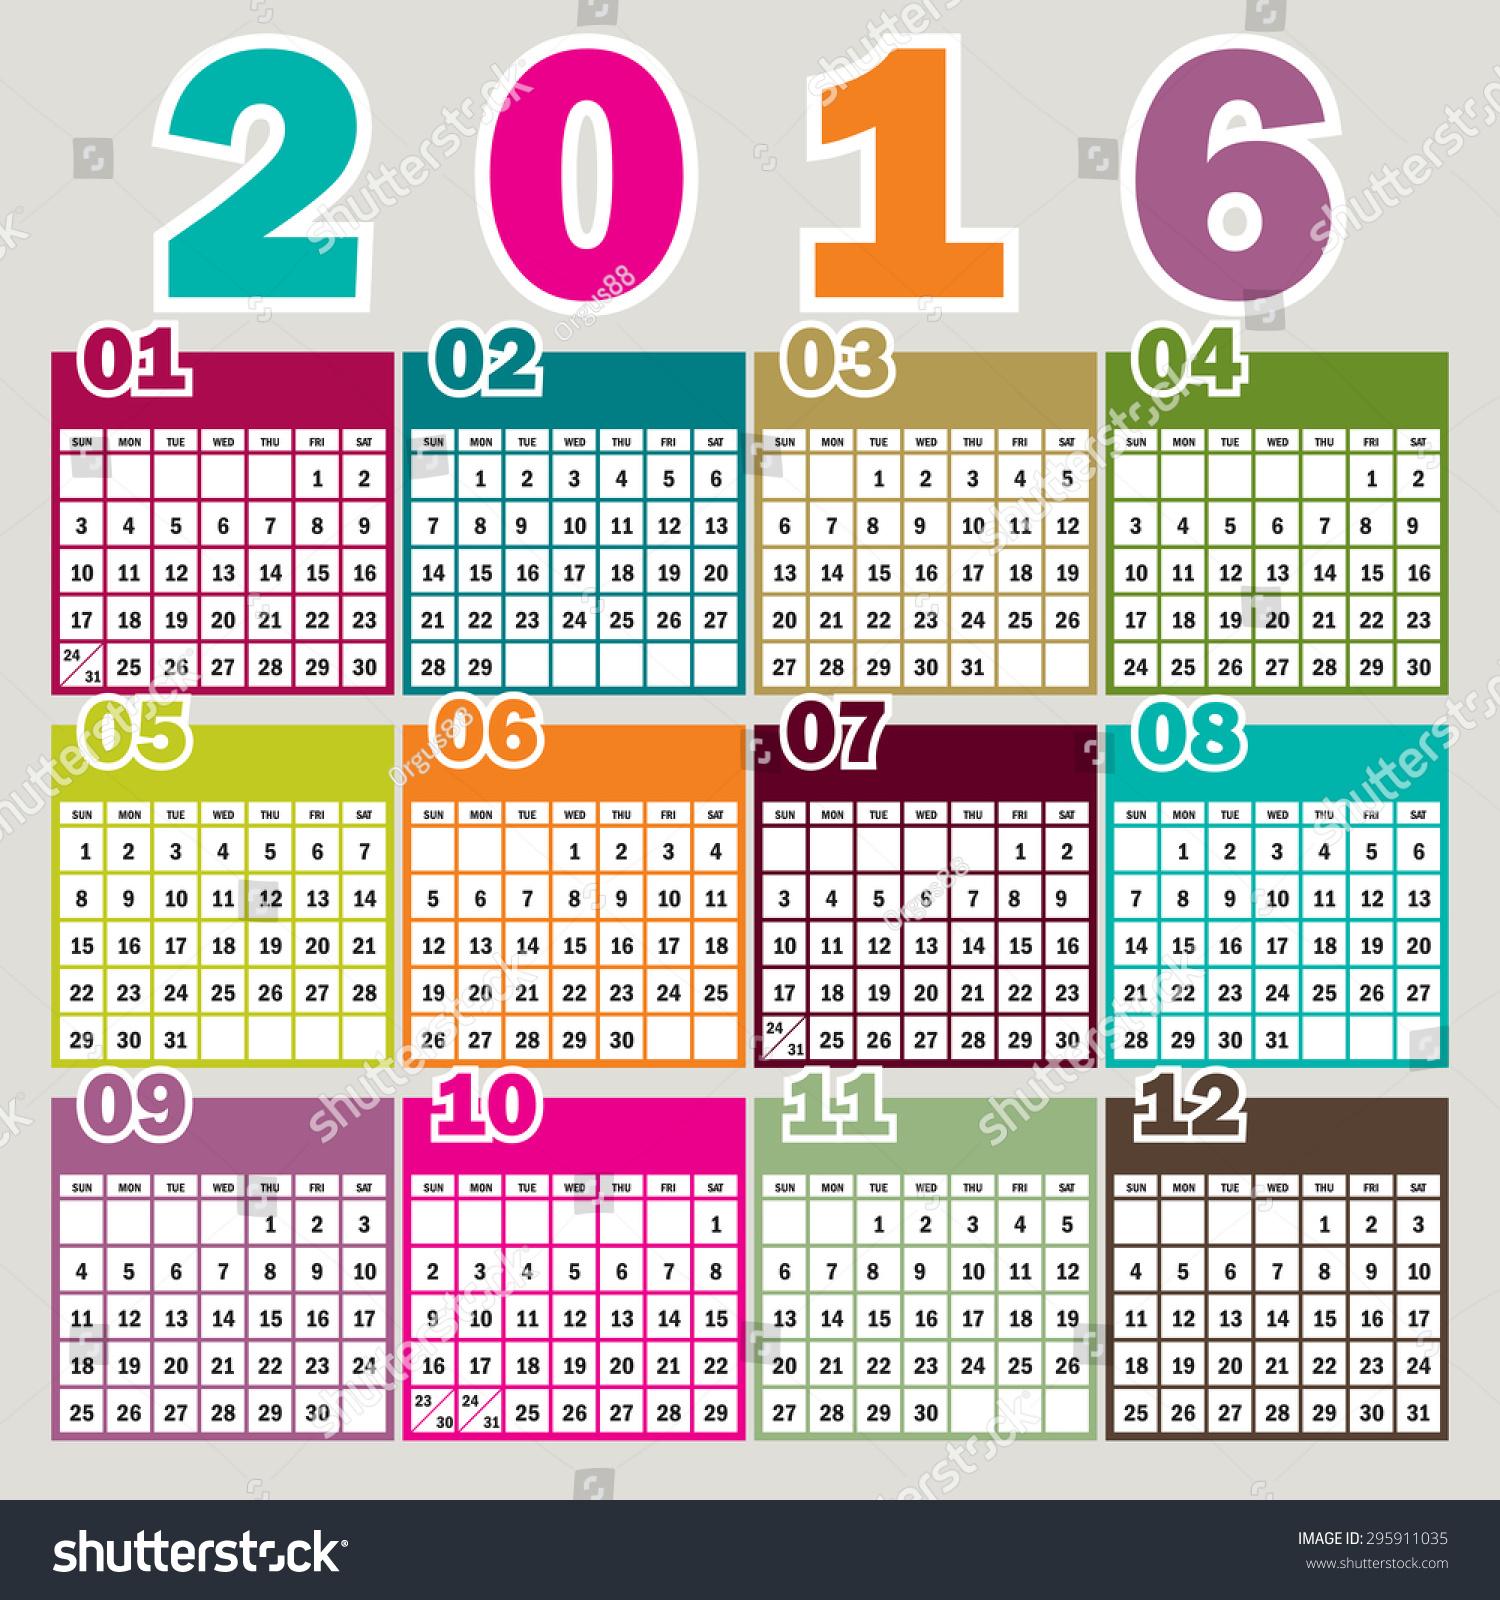 public holidays cambodia 2016 pdf